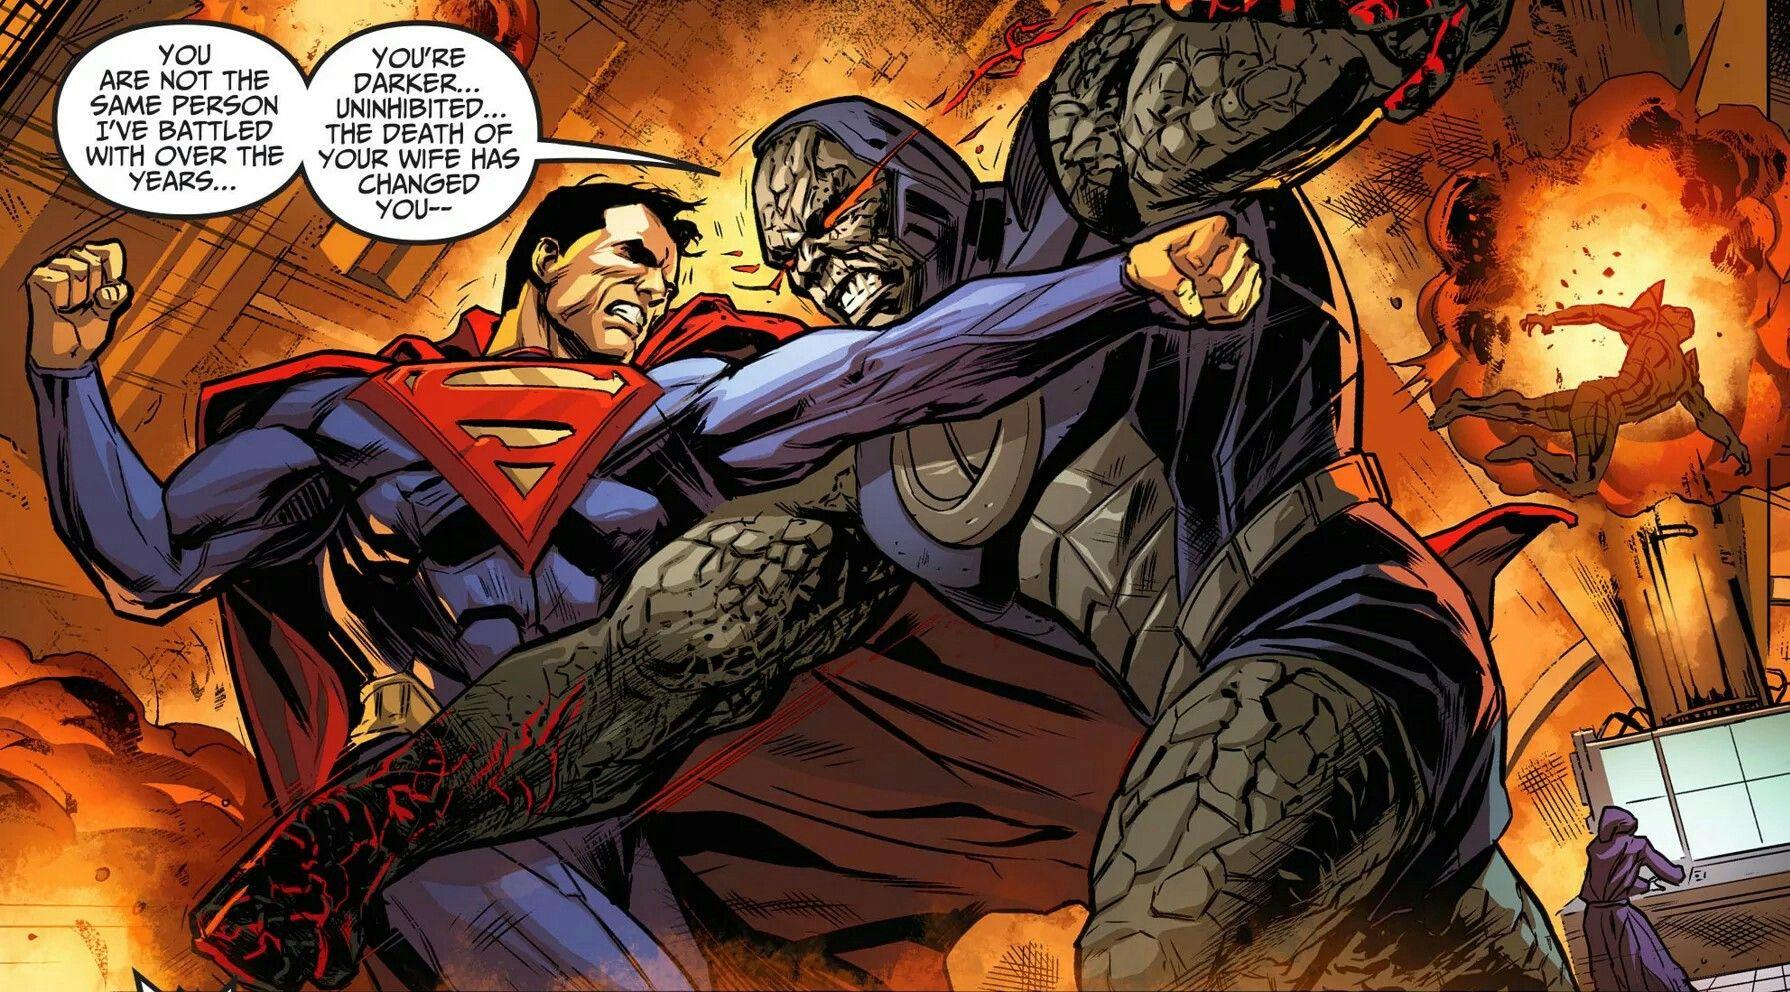 Darkseid fights Superman